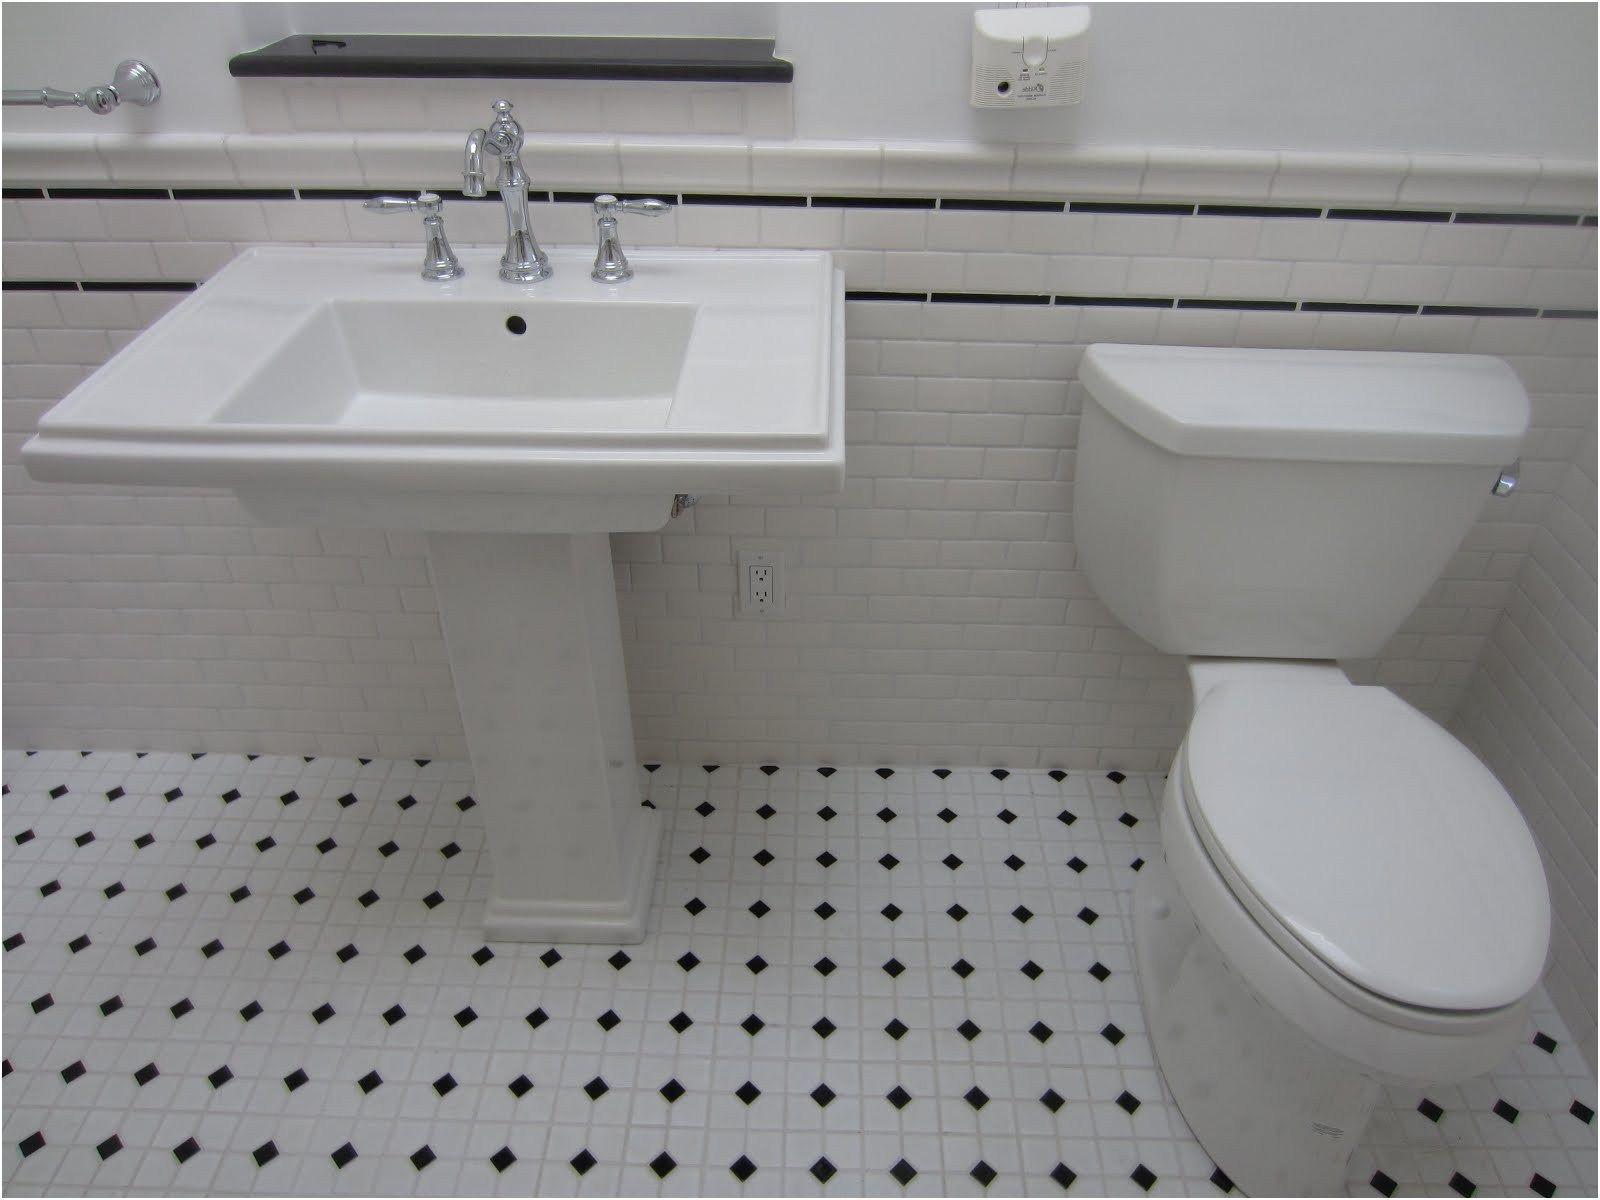 Tiles Glamorous Lowes Subway Tile White Home Depot Subway Tile From Subway Tile On Bathroom Floor